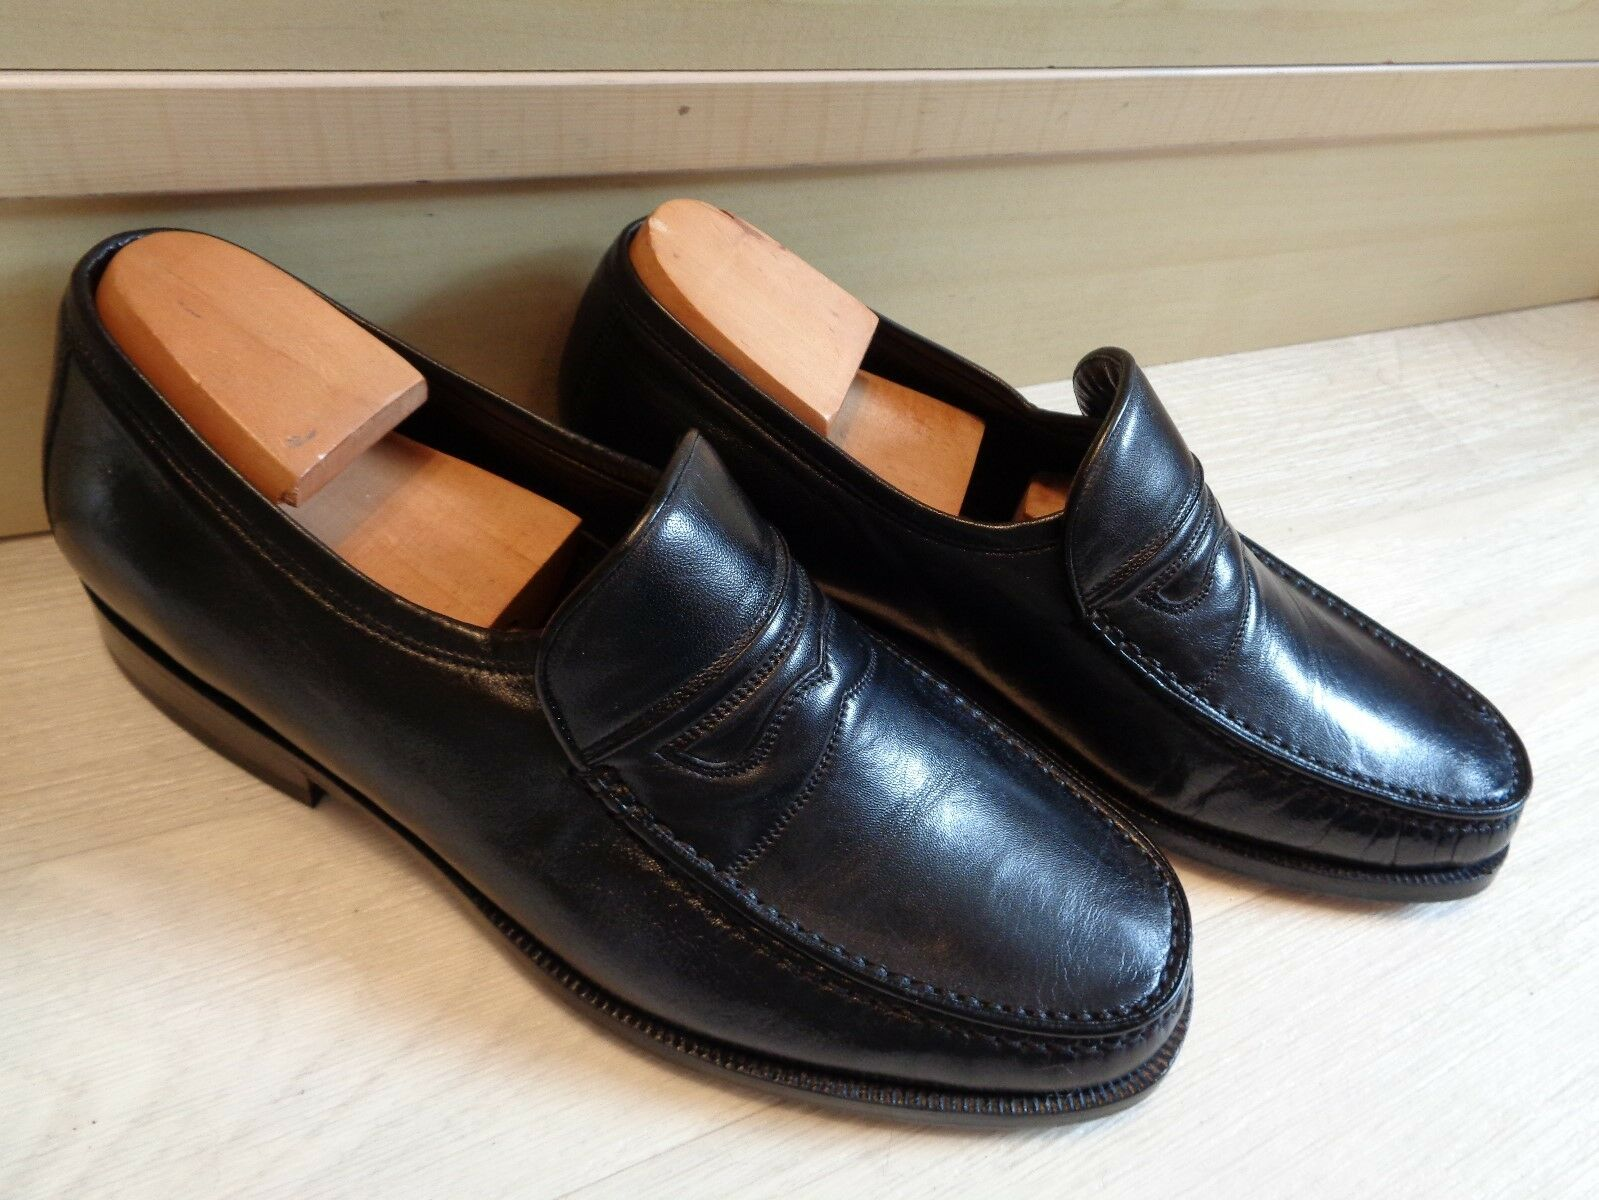 Loake black nappa moccasin UK 6 39.5 mens Made in  slip on leather loafer